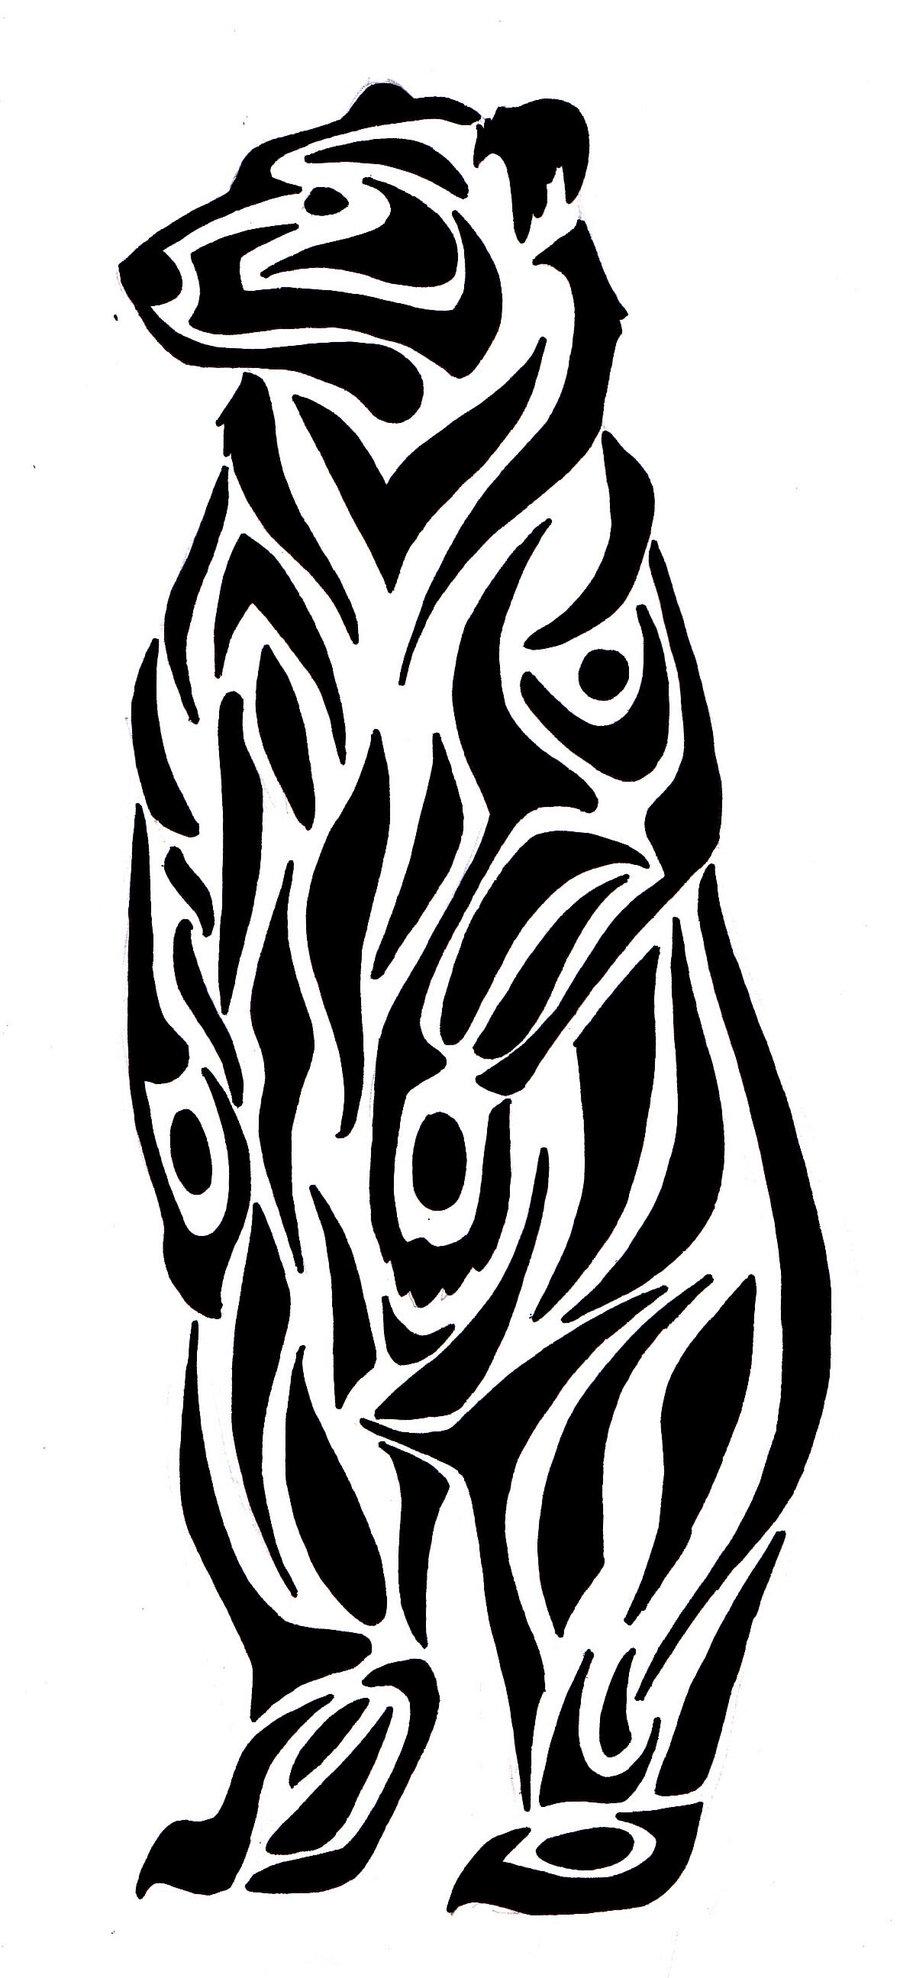 900x1978 Native American Drawings Of Bears